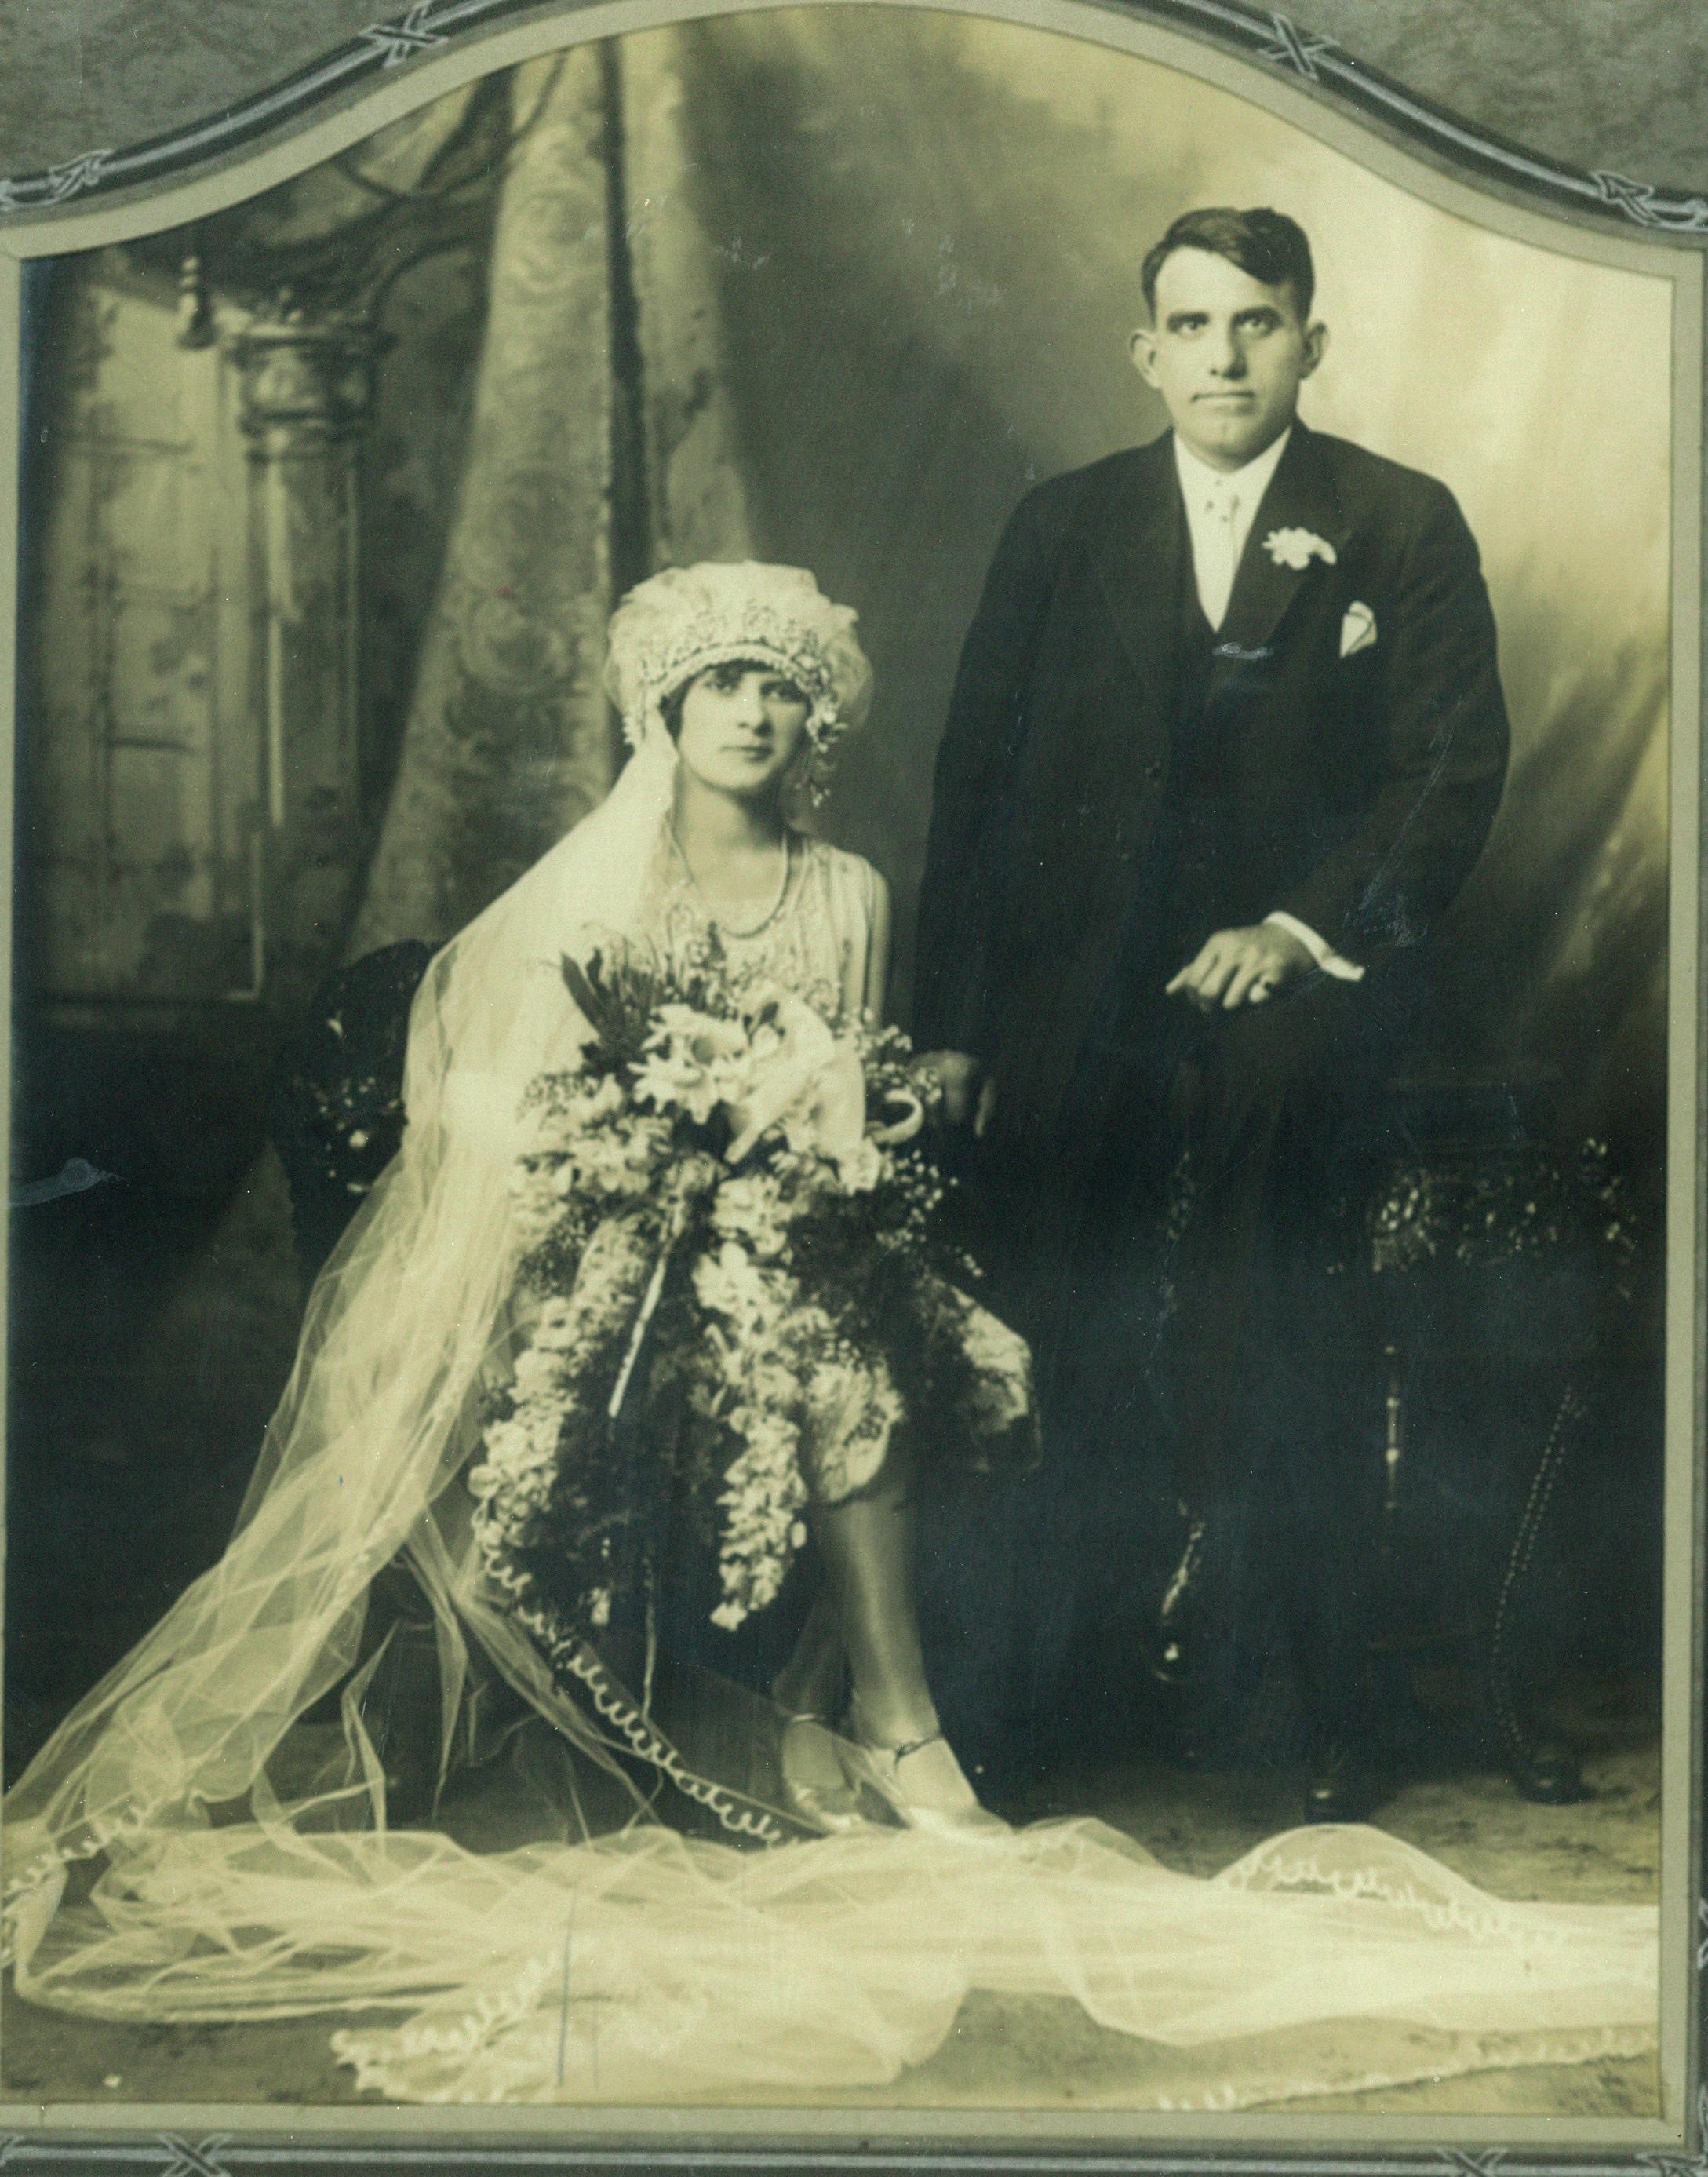 Maria and Vittorio Sangiacomo, 1927